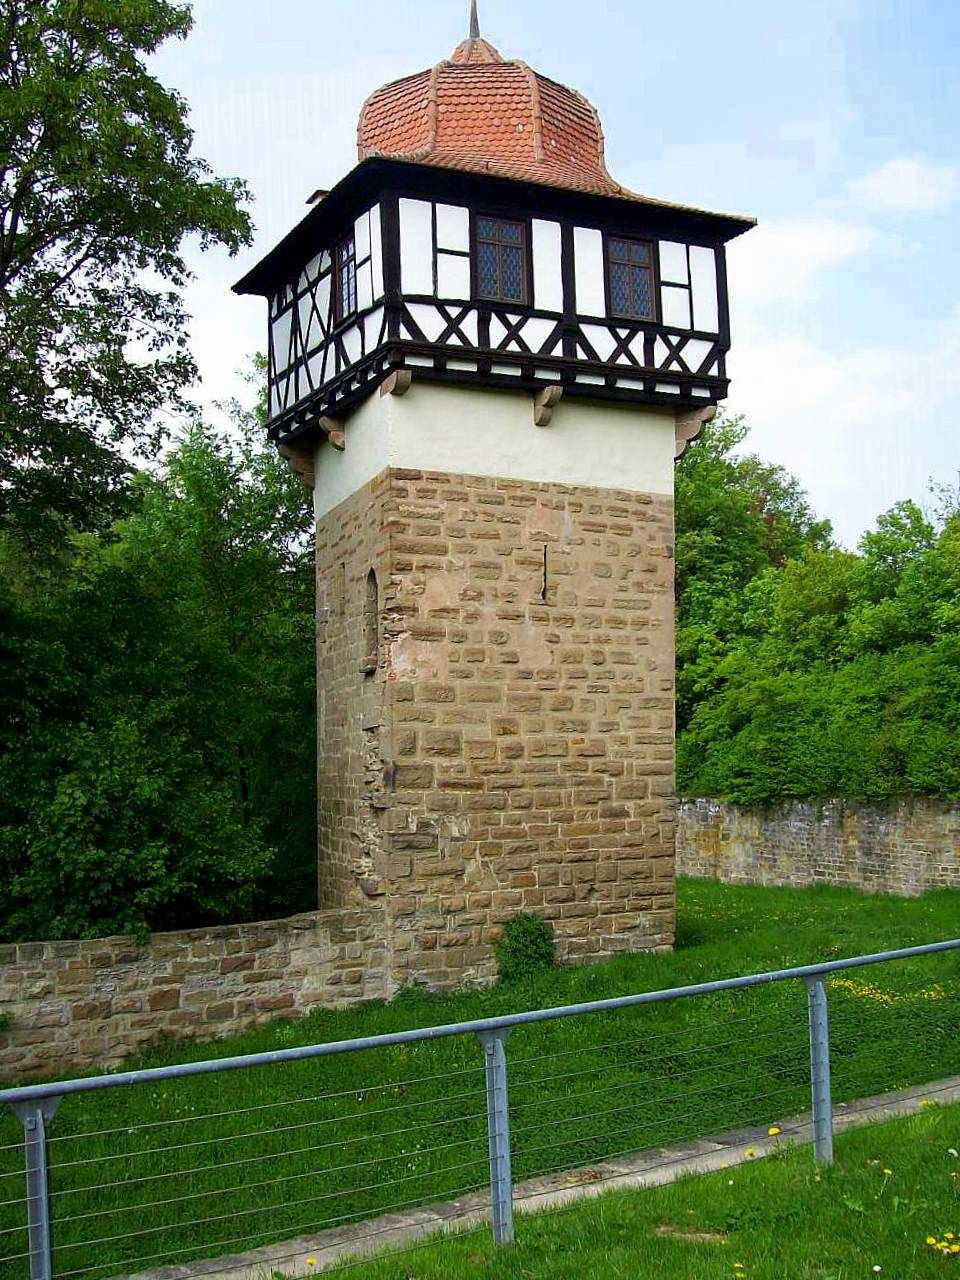 http://upload.wikimedia.org/wikipedia/commons/a/ac/Faustus_tower_Maulbronn_monastery.JPG